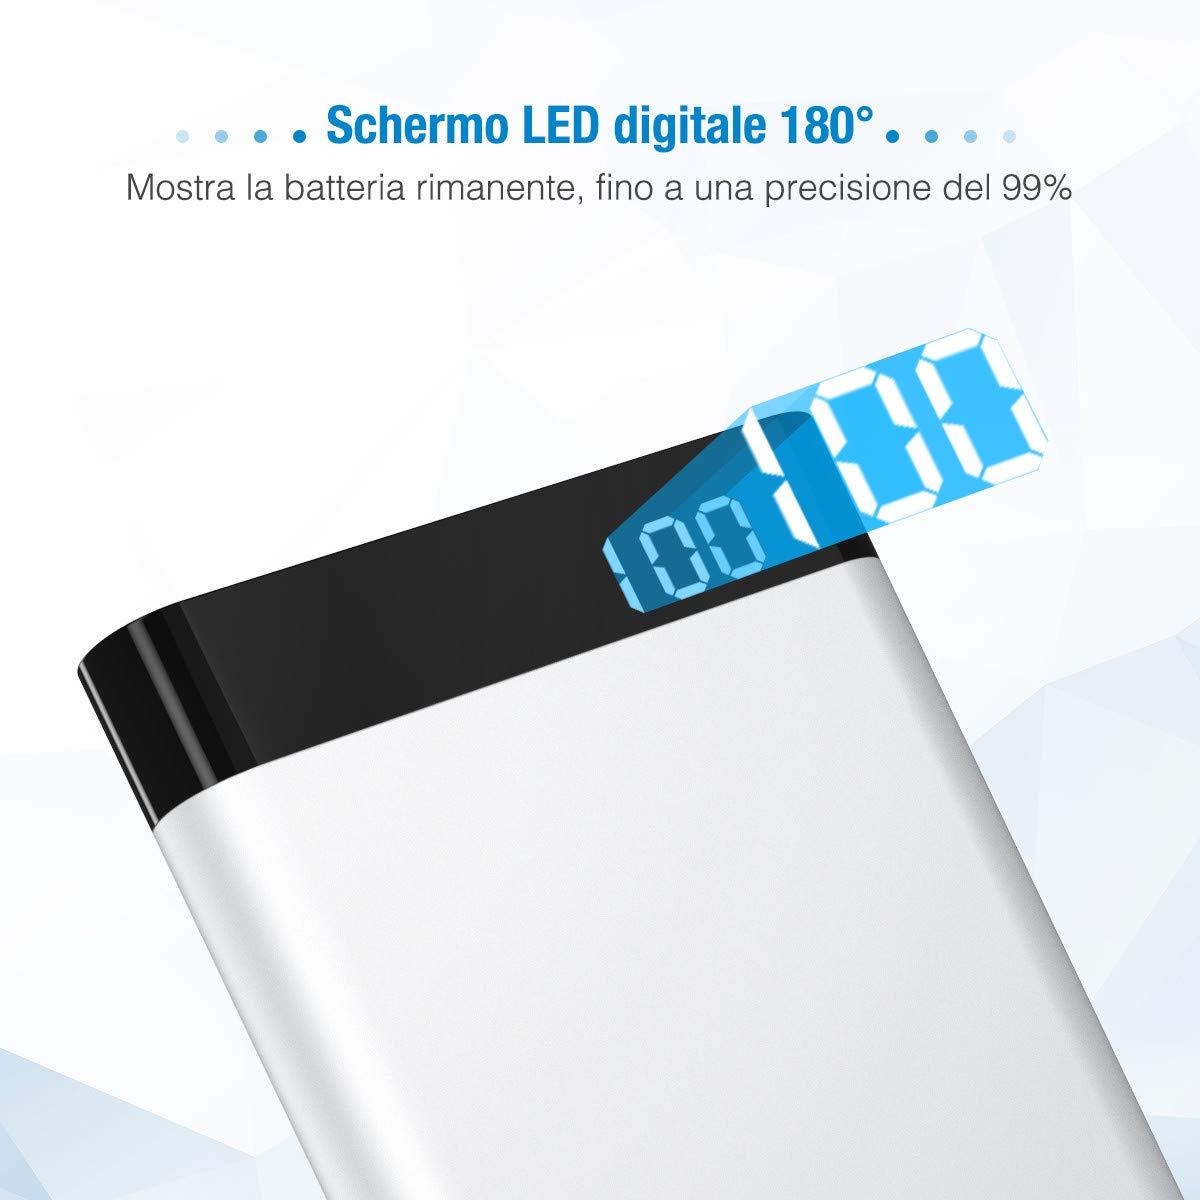 POWERADD Virgo II Powerbank Batteria Portatile 10000mAh con 2 Uscite, Caricabatterie Portatile con display LED, Entrata Lightning + Type-C per iPhone X / 8/7 / 6, Samsung S9 / S8 + e tanti altri - ARGENTO